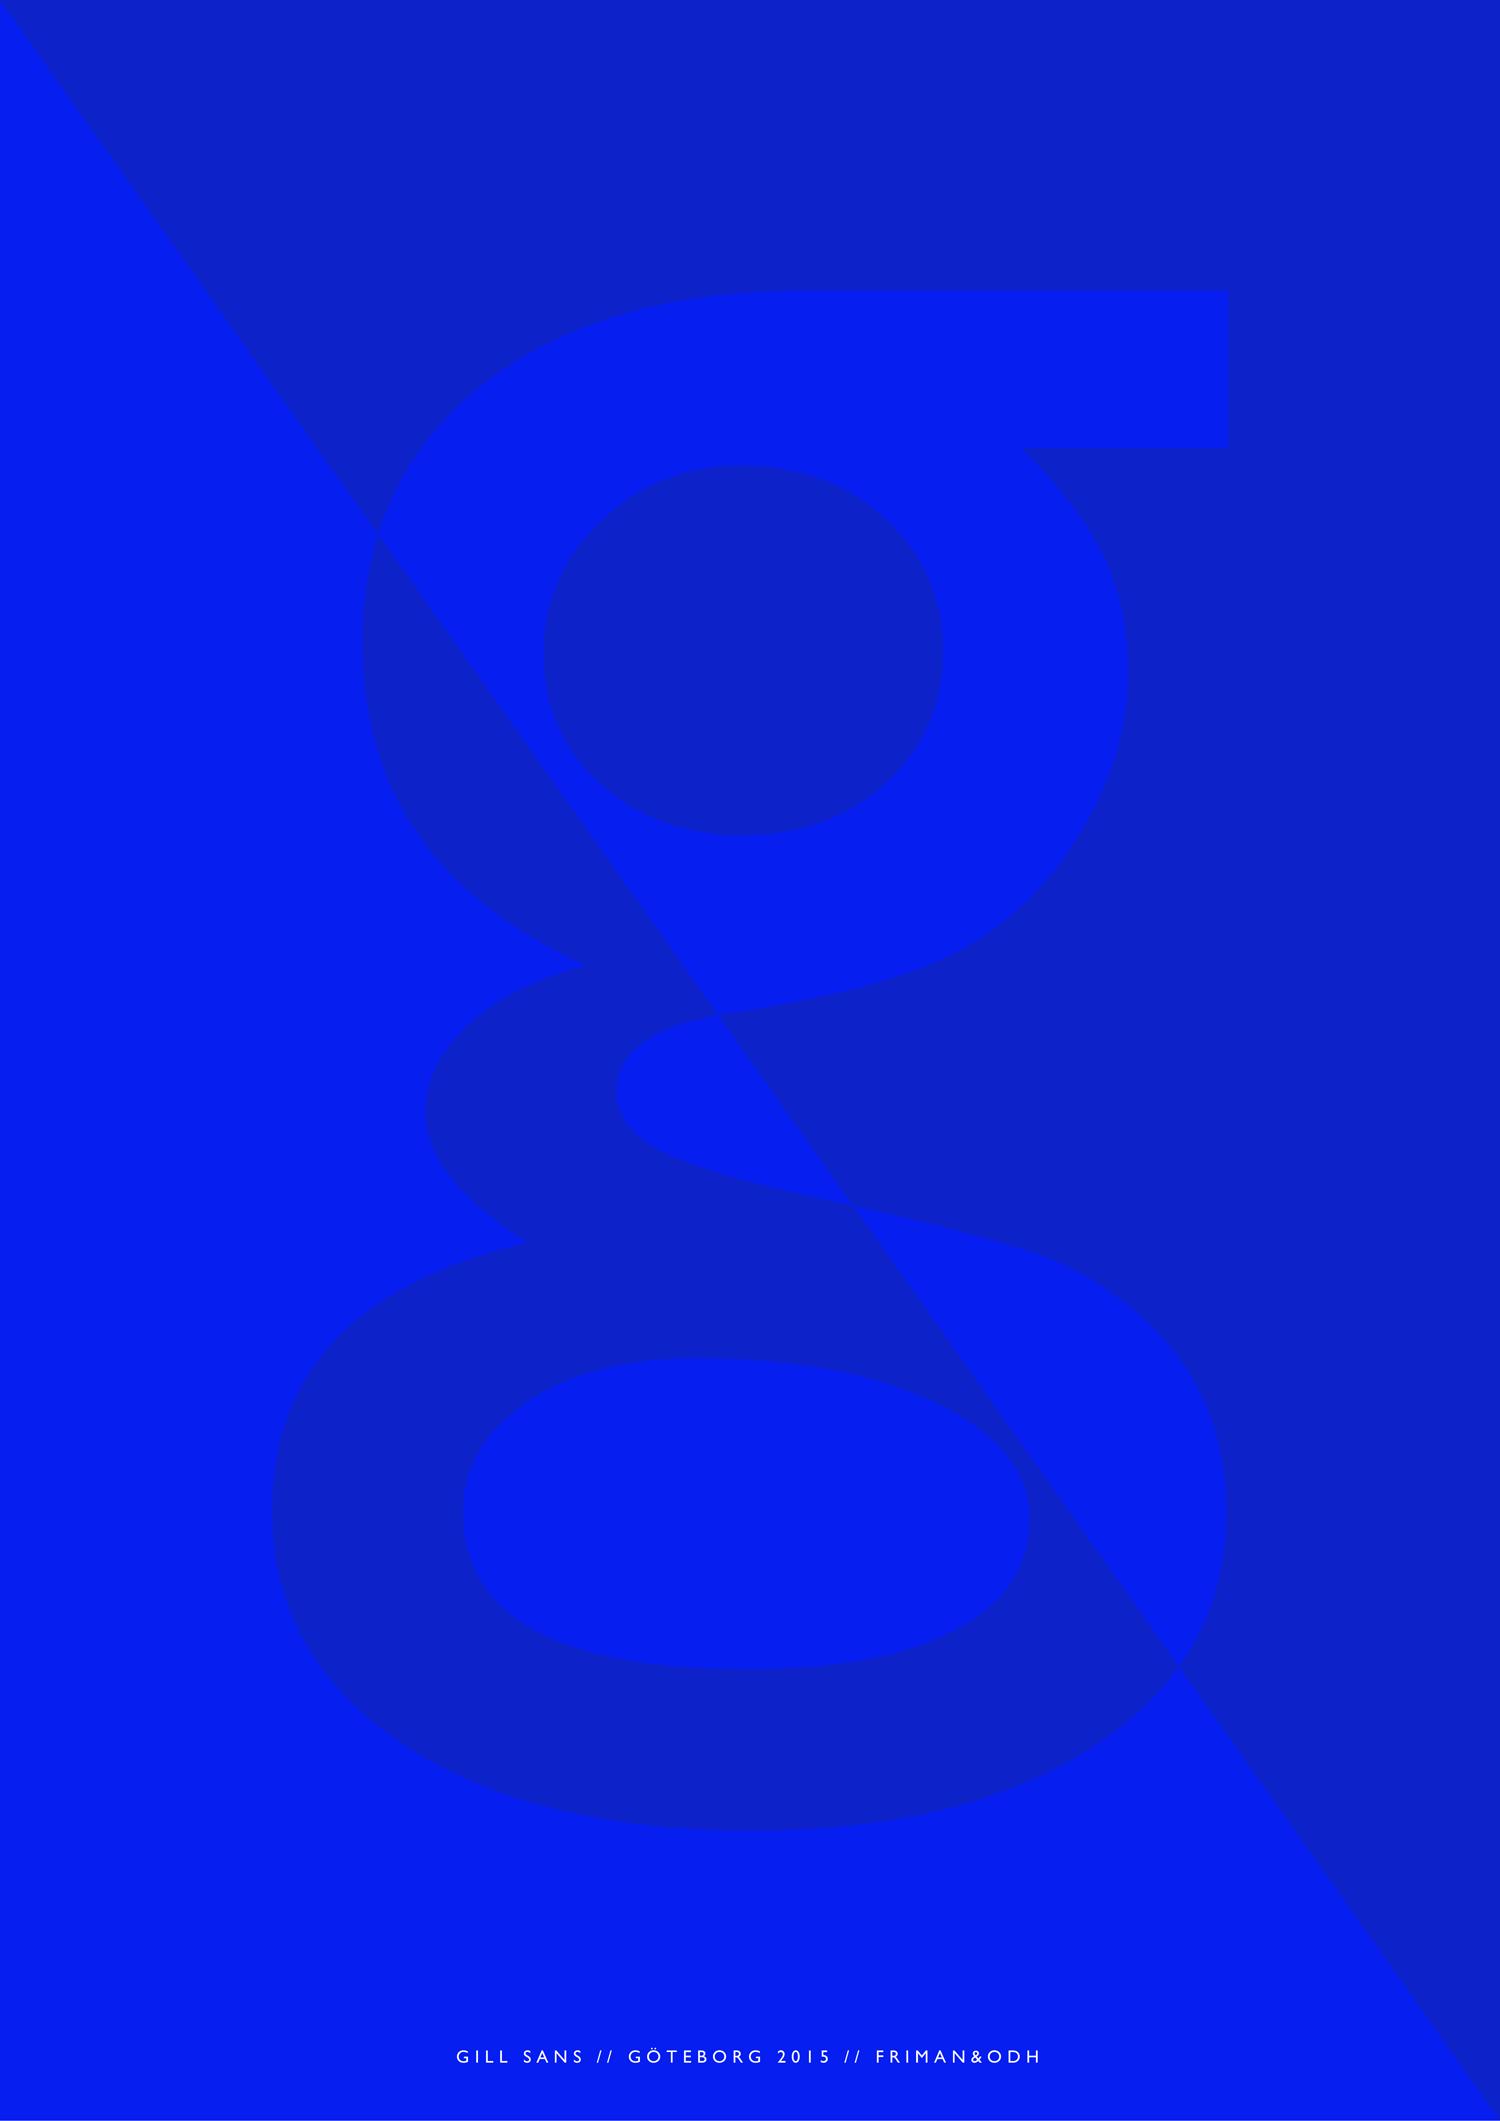 Gill_Sans_1